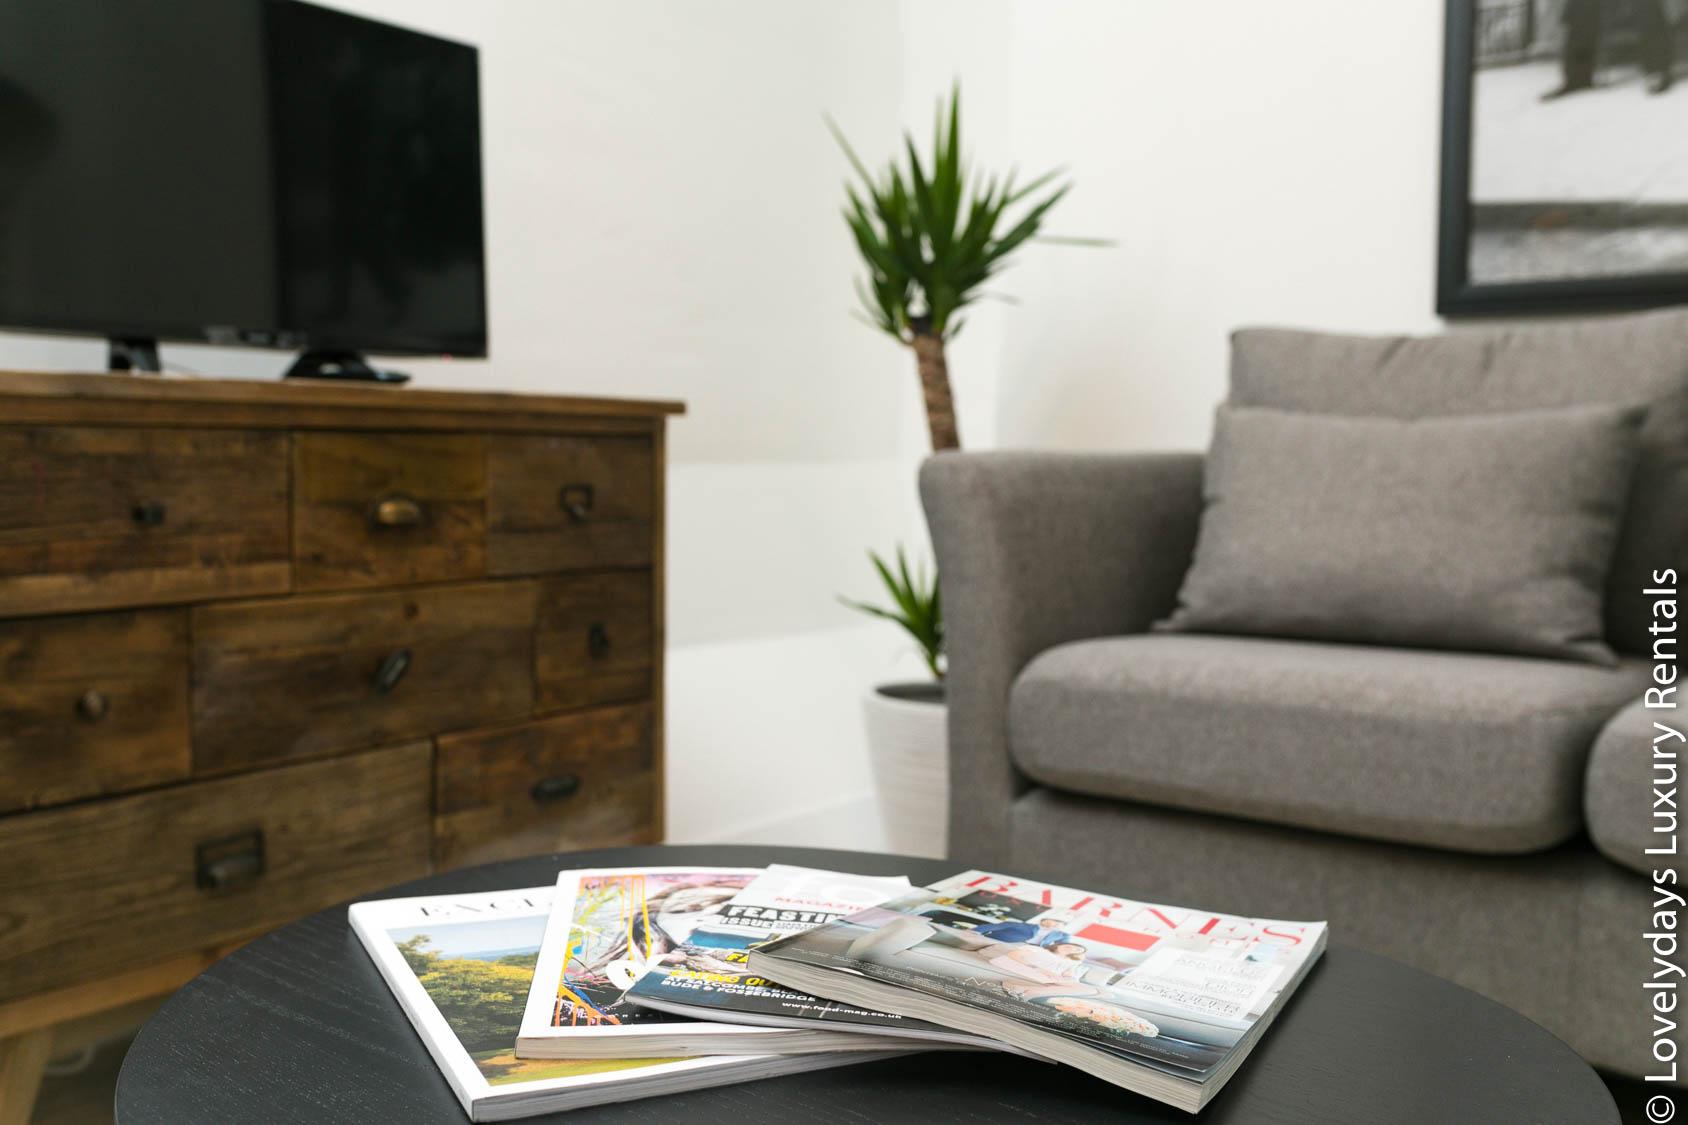 Lovelydays luxury service apartment rental - London - Fitzrovia - Goodge 55 - Lovelysuite - 2 bedrooms - 3 bathrooms - Comfortable sofa - a7f4cb21eb5e - Lovelydays